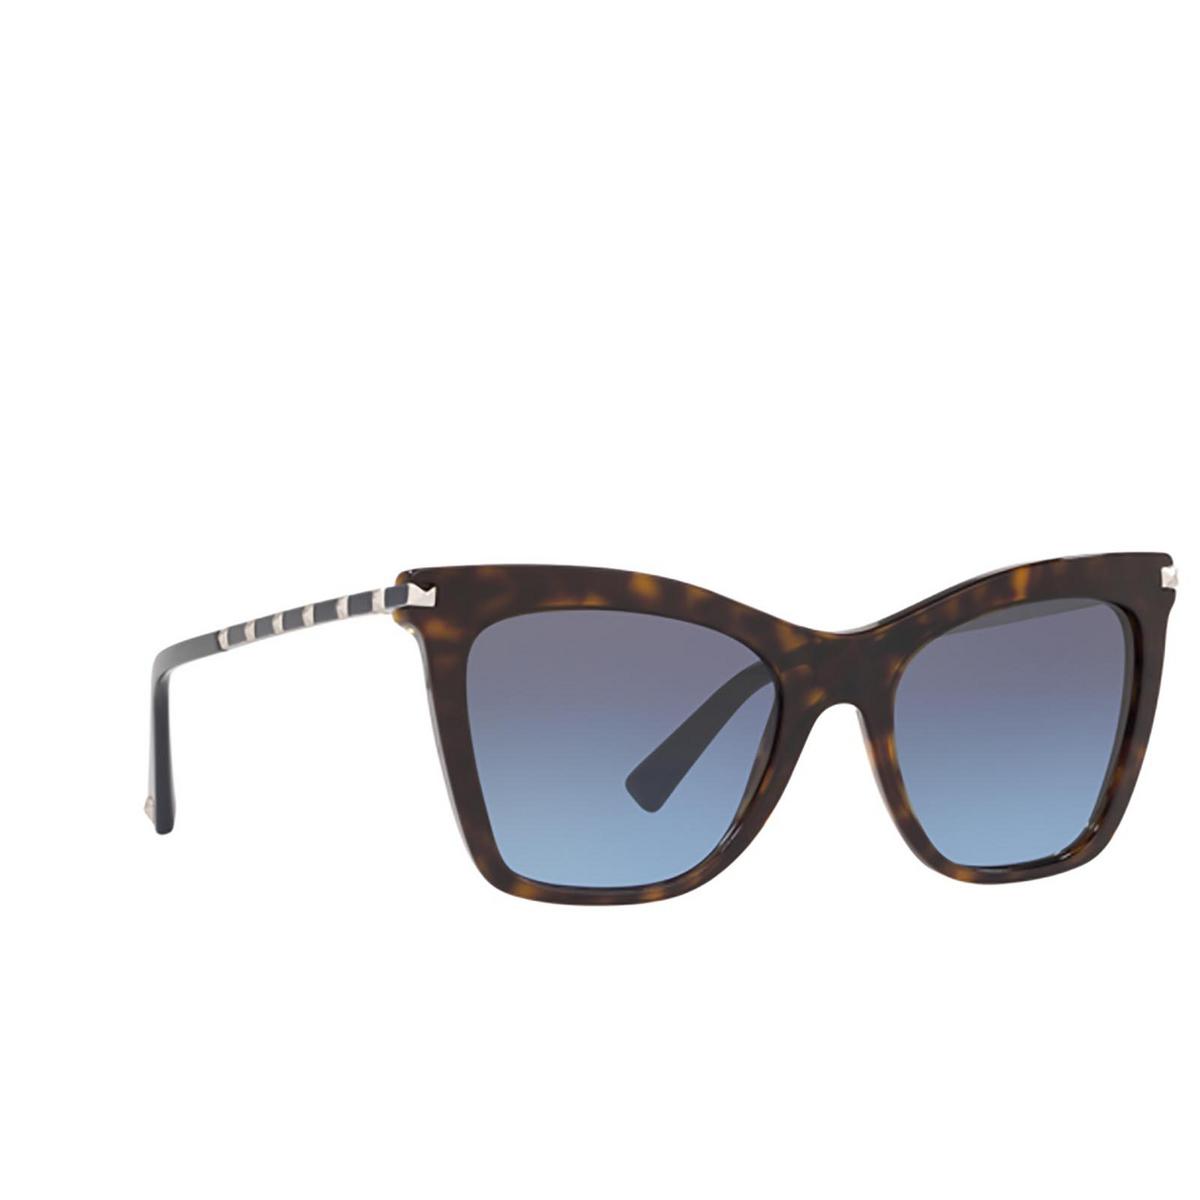 Valentino® Cat-eye Sunglasses: VA4061 color Havana 50028F - three-quarters view.